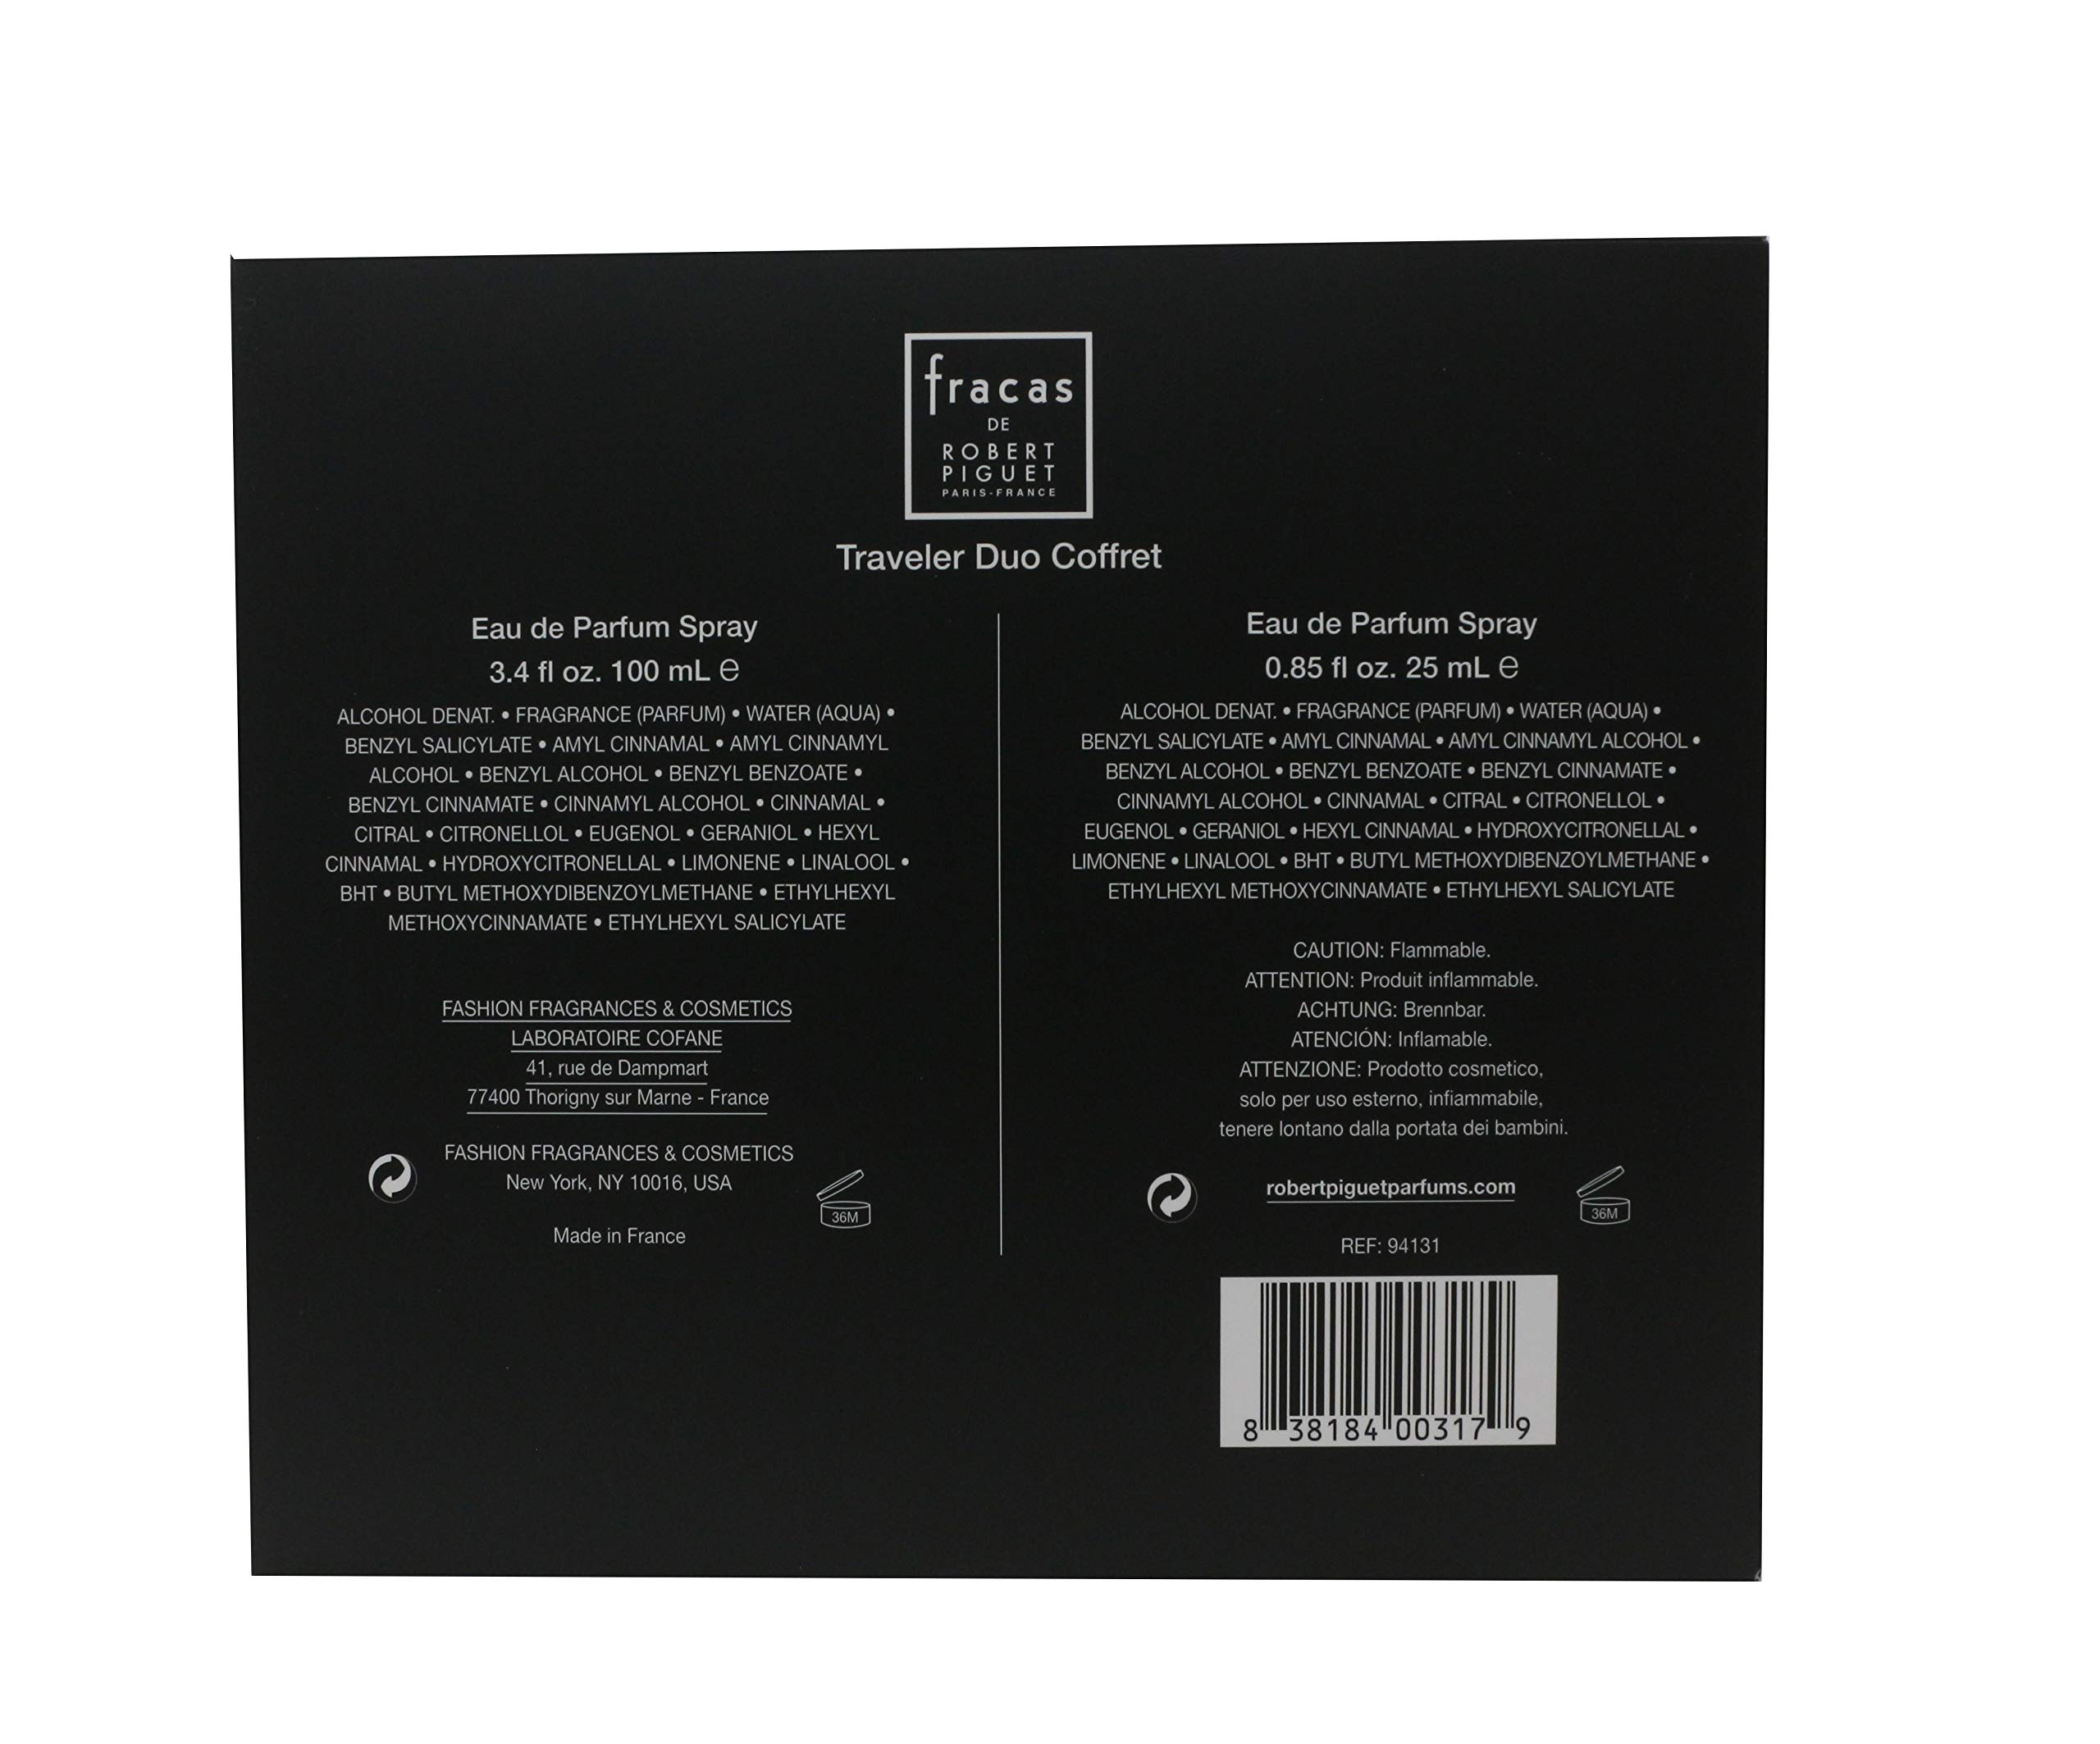 Robert Piguet Fracas Traveler Set (3.4 oz and 0.85 oz Sprays)